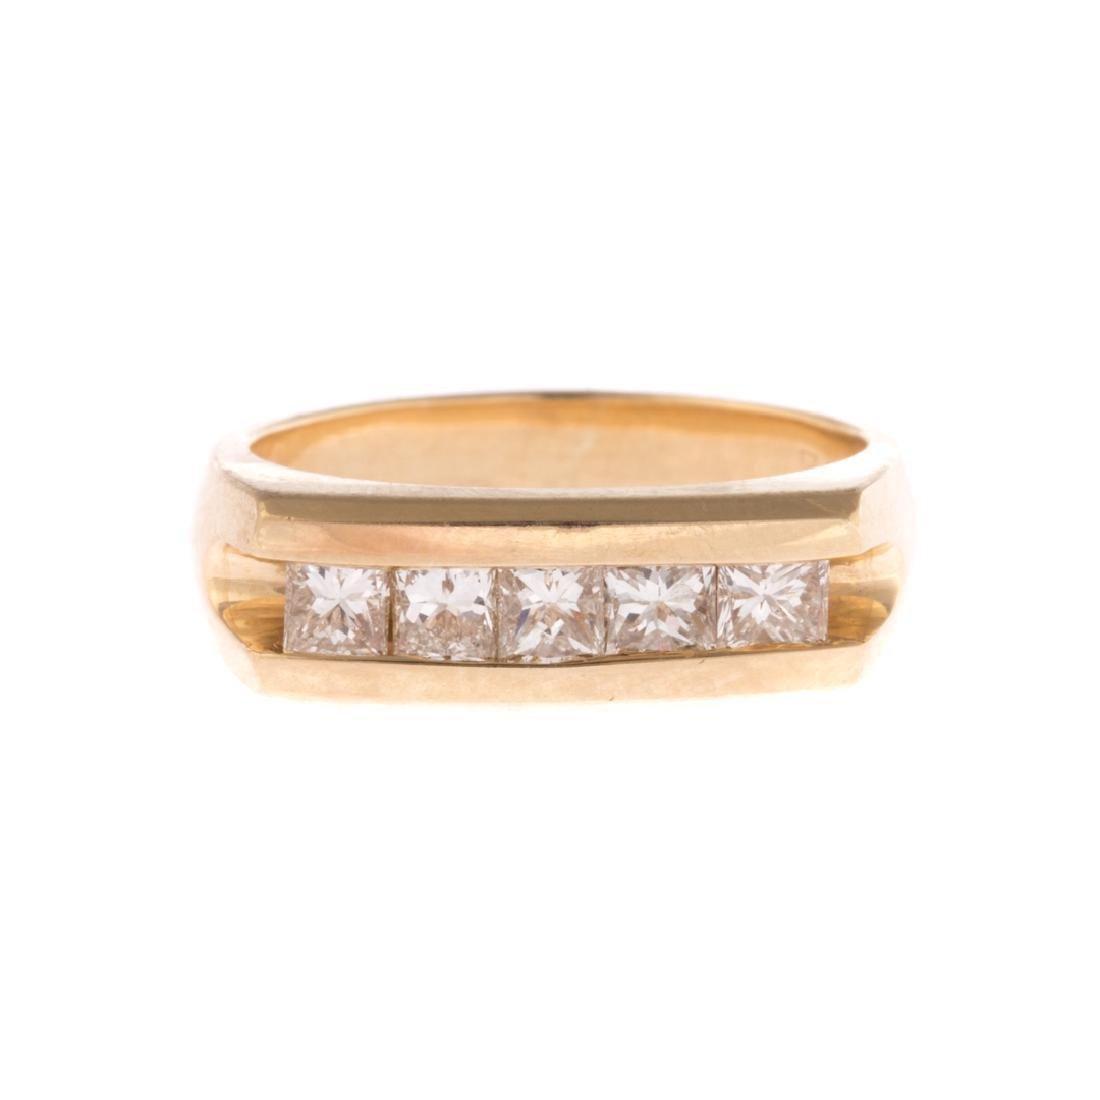 A Gentleman's Contemporary Diamond Ring